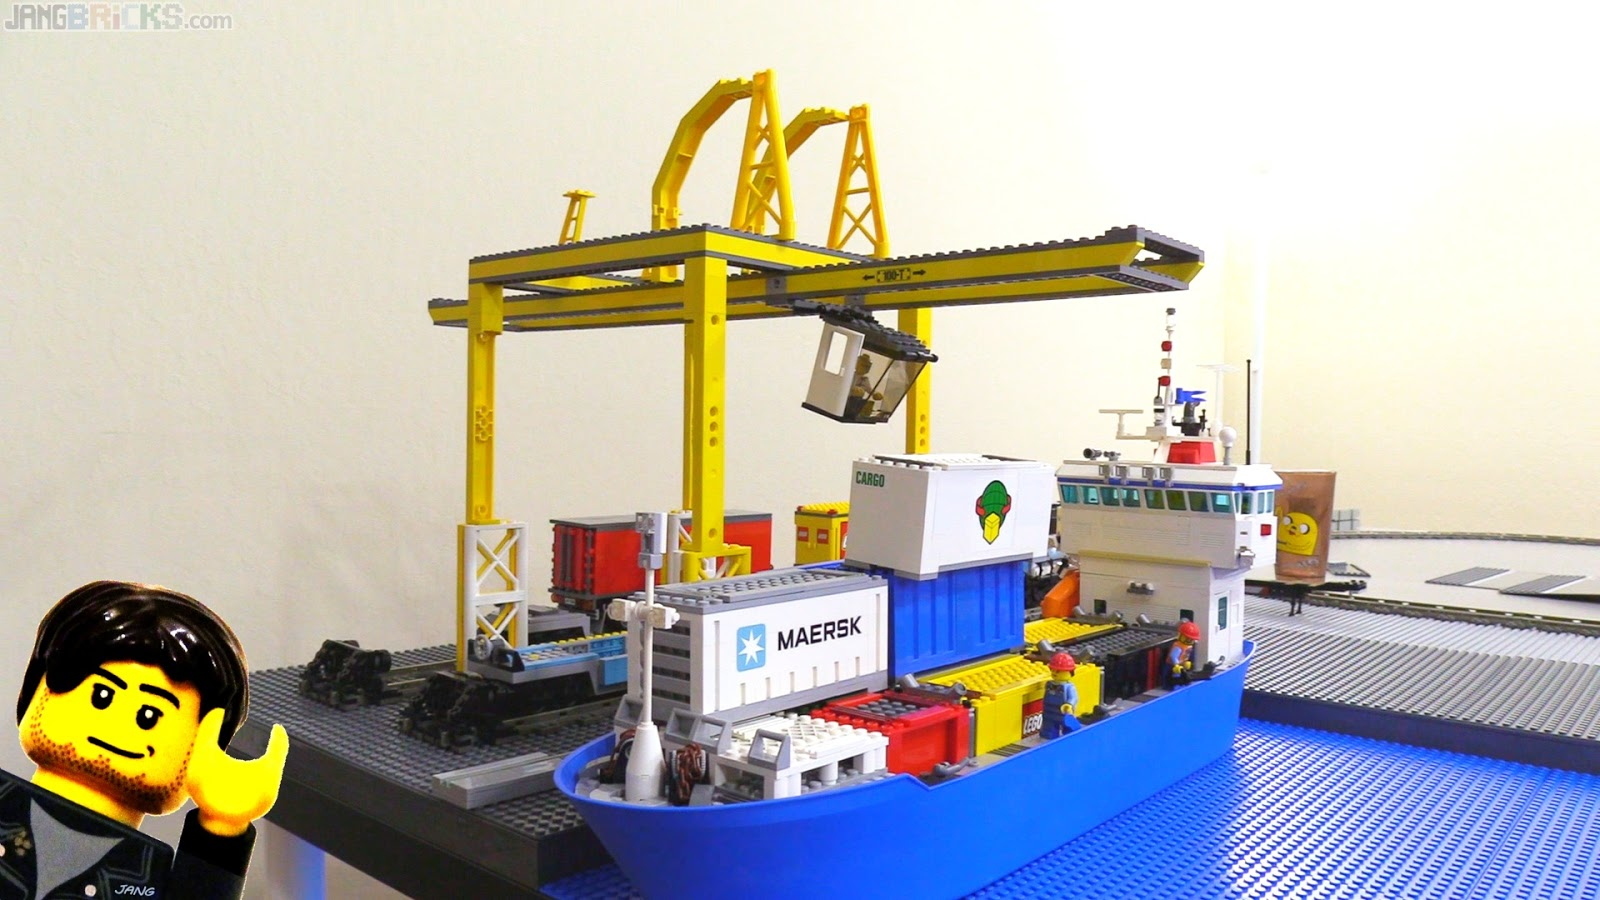 Ksp Gantry Crane : Starting work on my largest cargo port crane